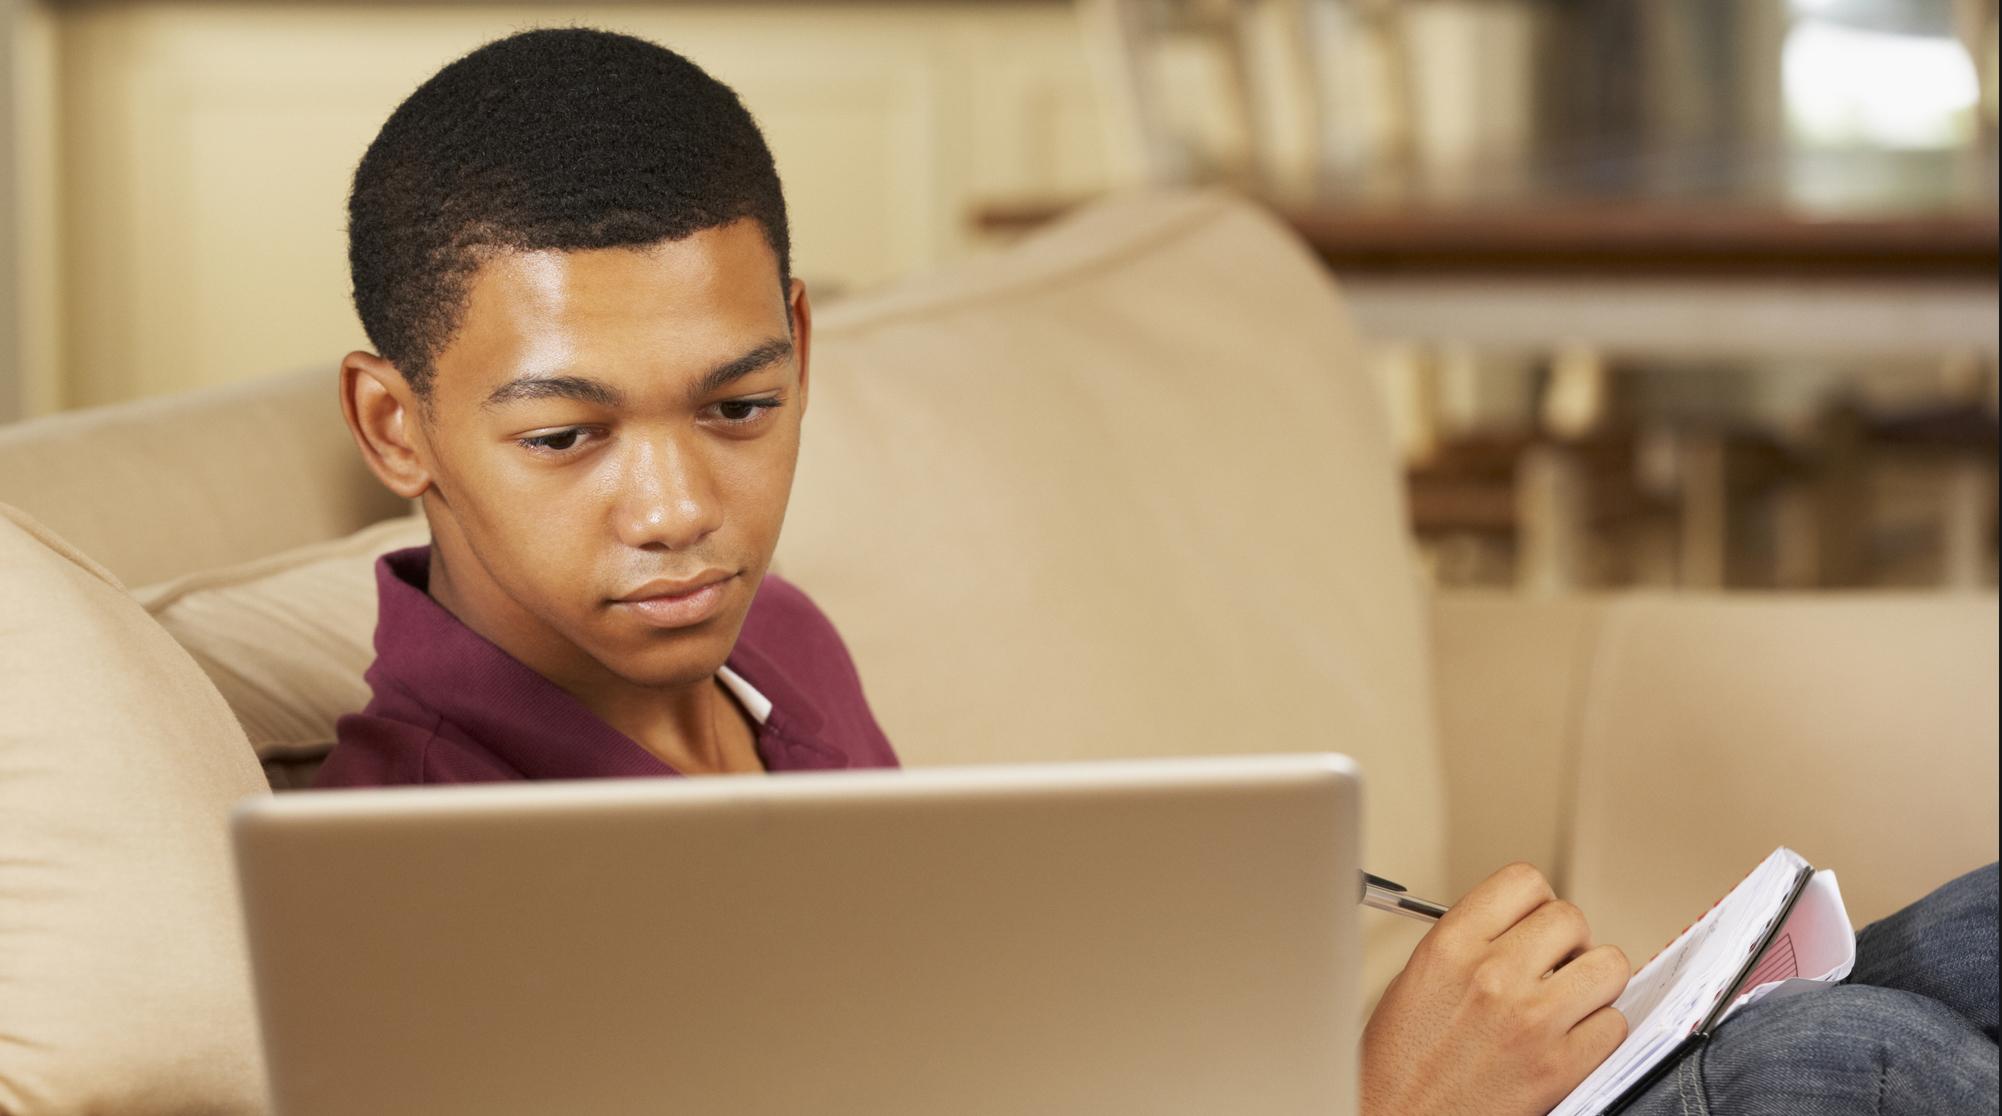 Duke study homework helps students